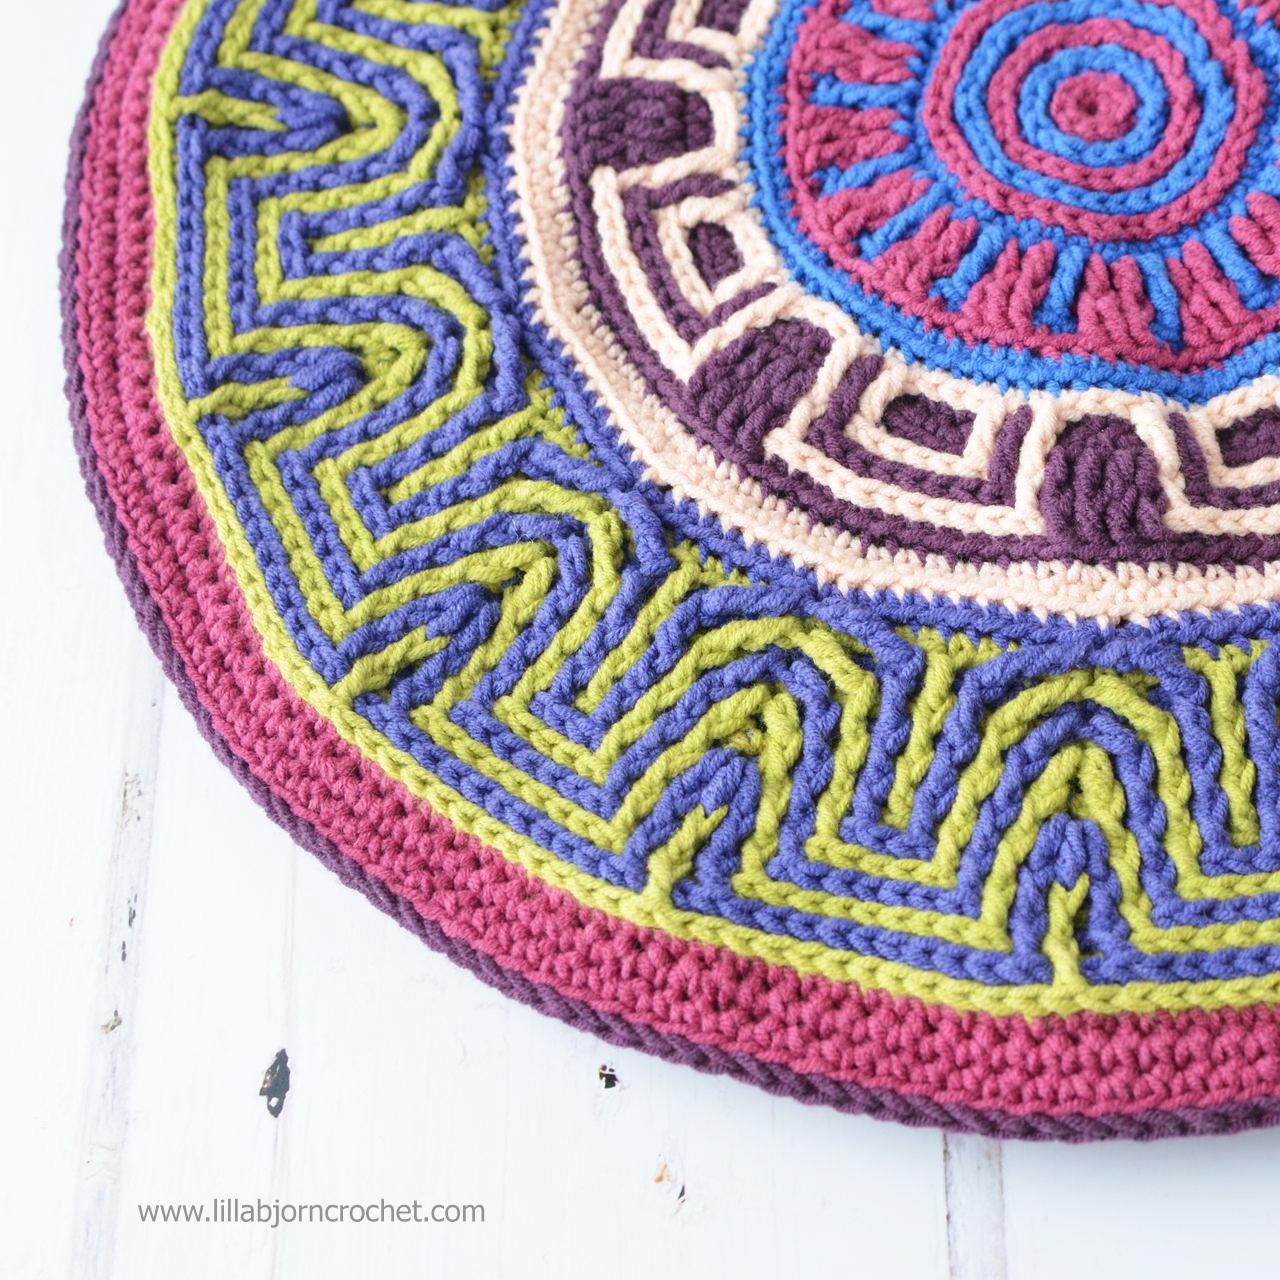 Labyrinth Mandala - original overlay crochet design by Lilla Björn. www.lillabjorncrochet.com